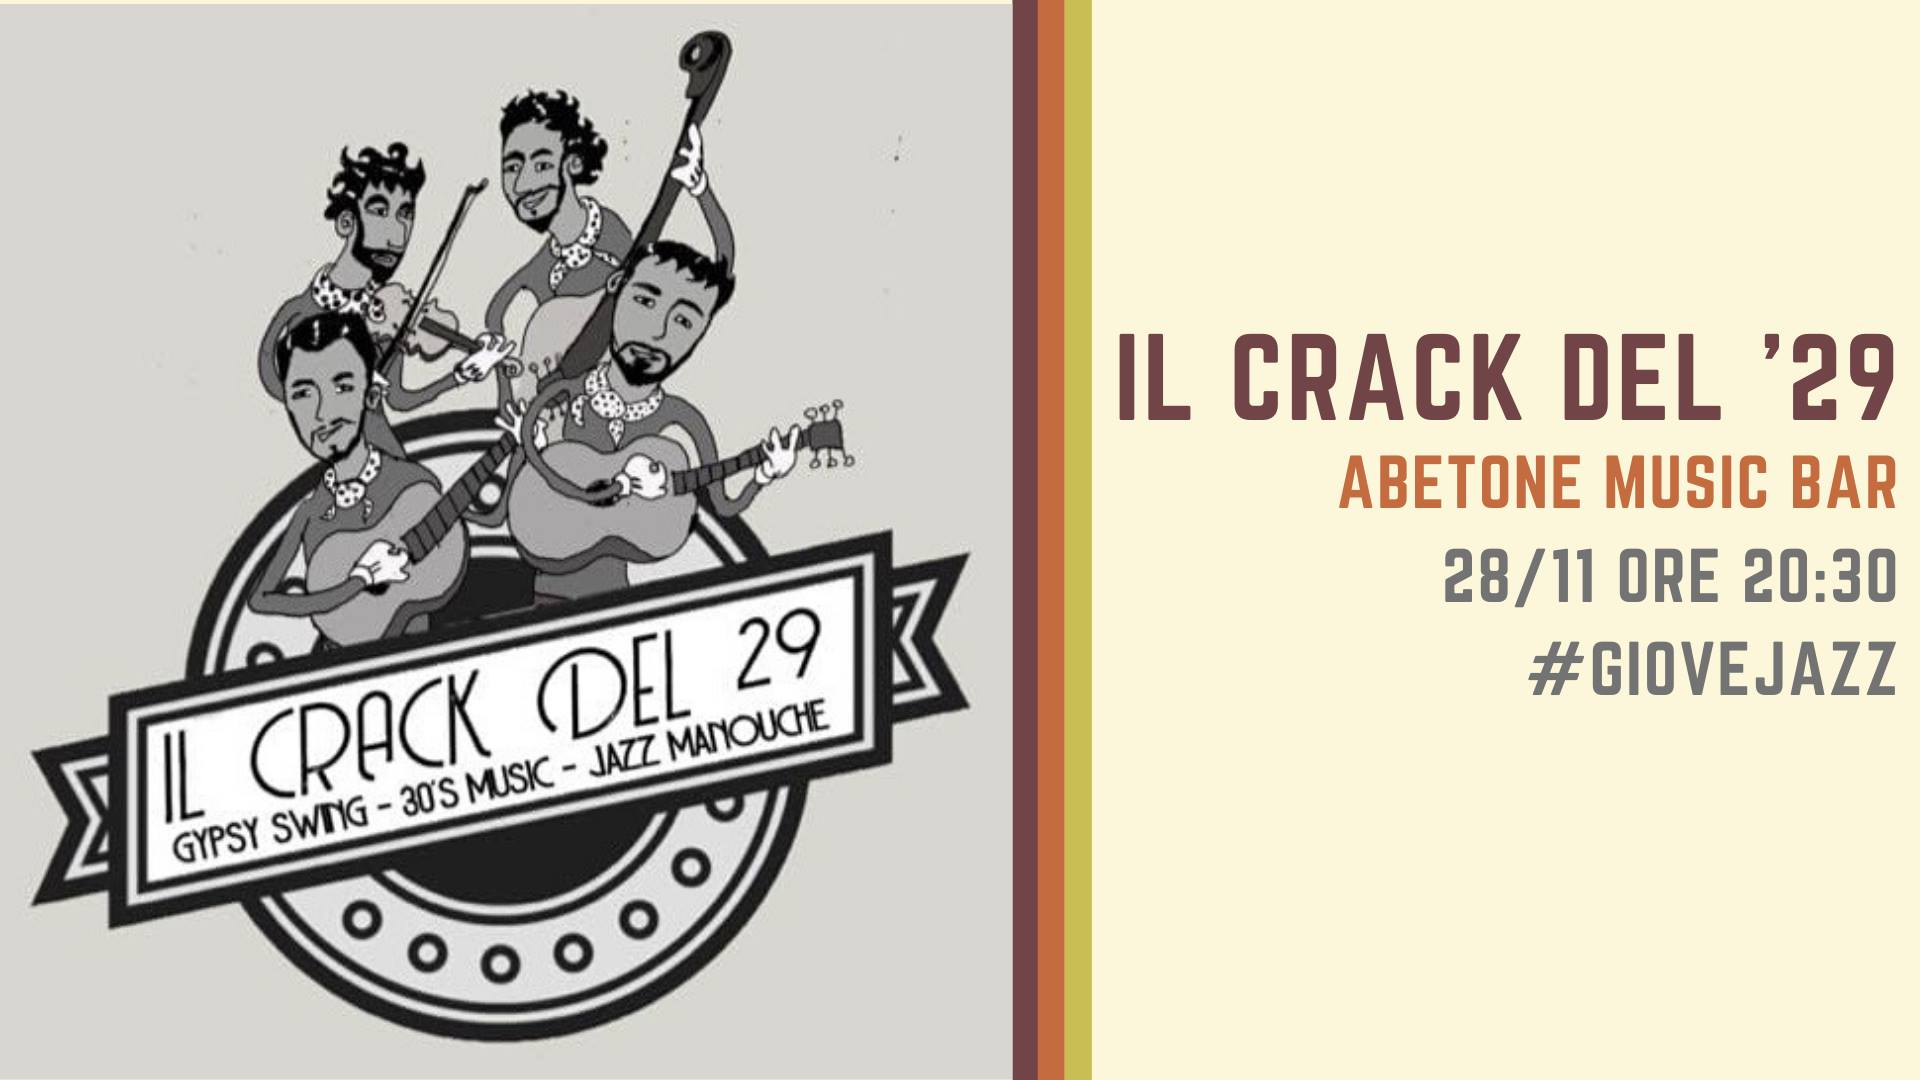 Giovejazz - Crack del '29 - Abetone Music Bar - Sassari - 28 novembre 2019 - eventi - 2019 - Sa Scena Sarda